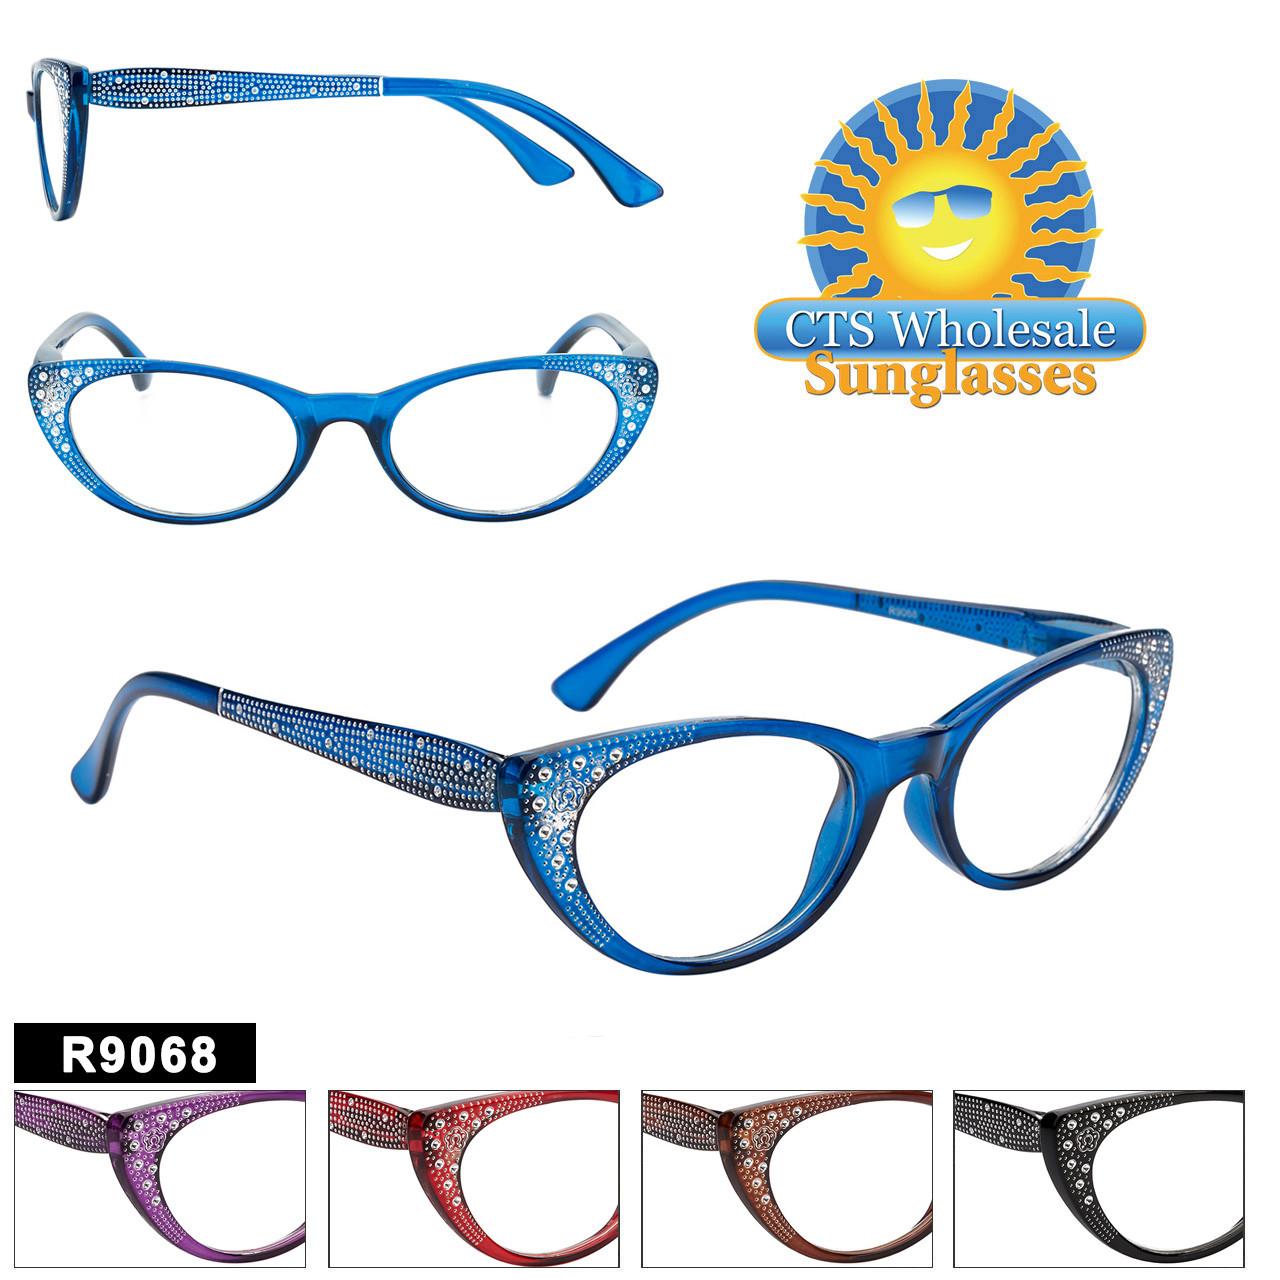 Wholesale Reading Glasses - R9068